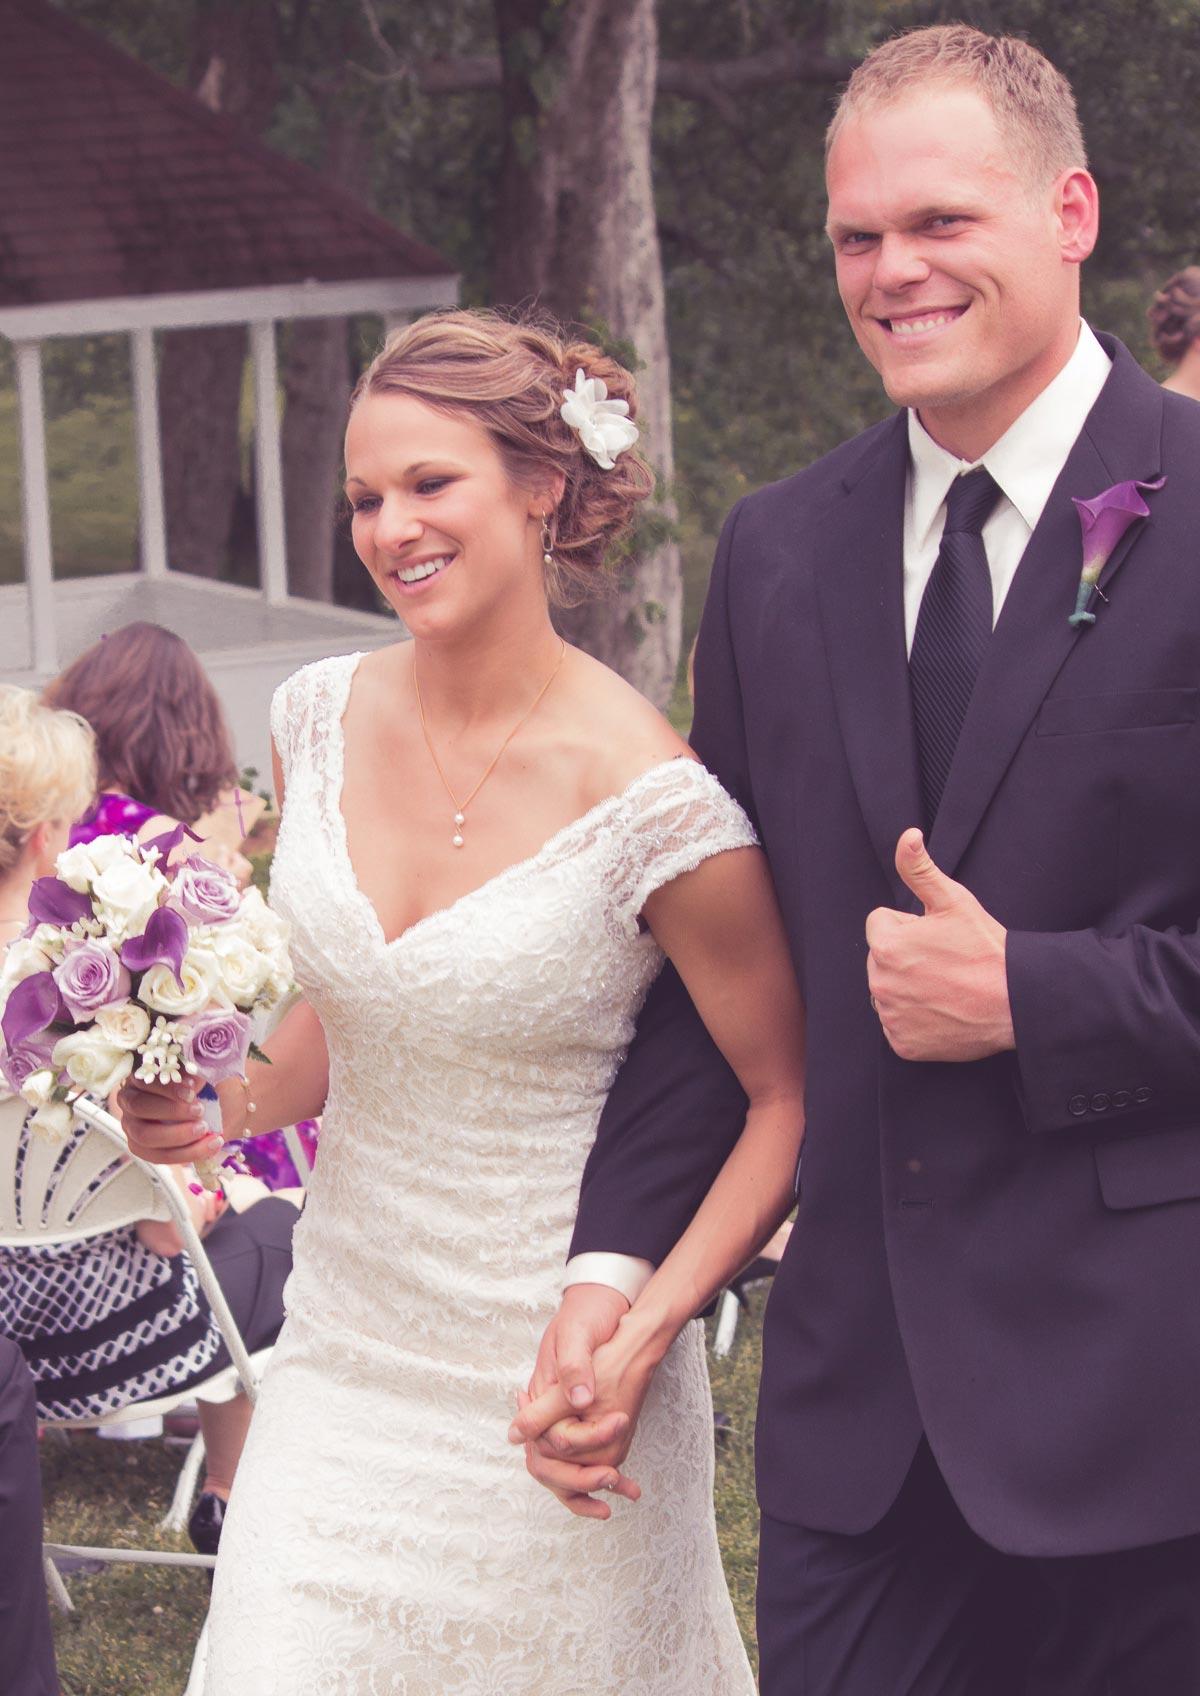 evansville-wedding-photographer-pabst-photo-kokies-echo-valley-(77)